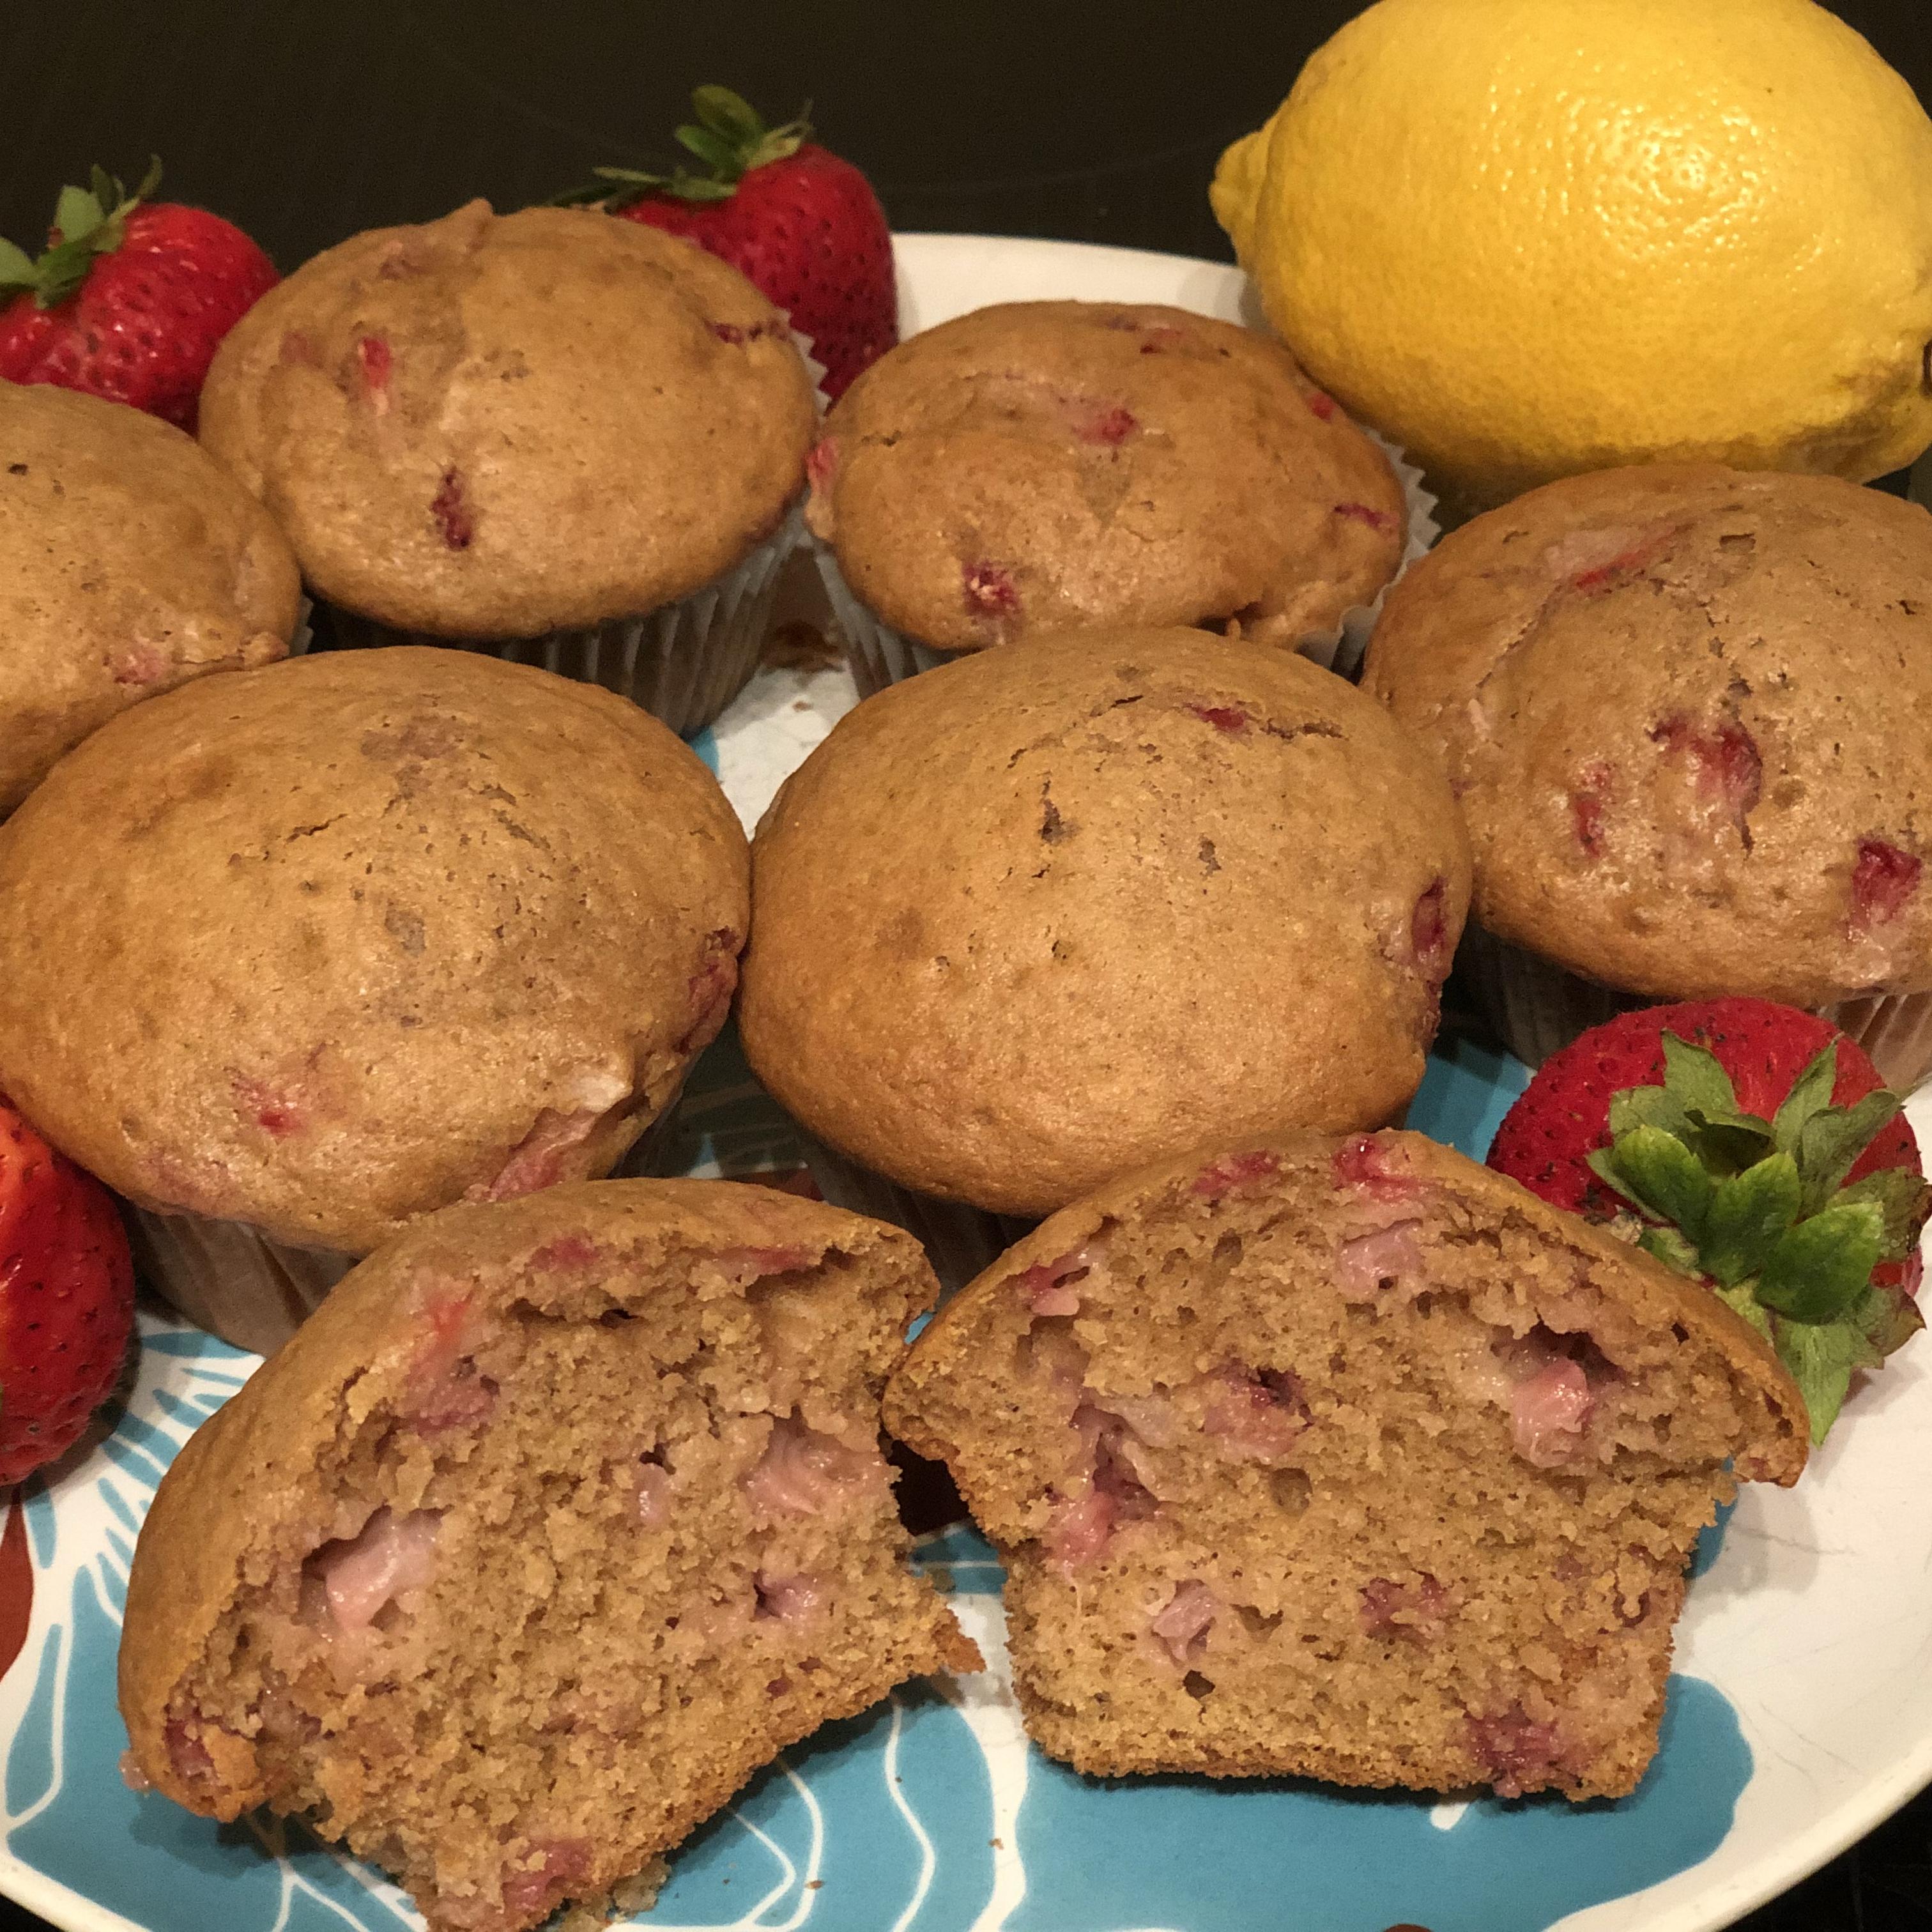 Strawberry Lemonade Muffins MagdaCooks